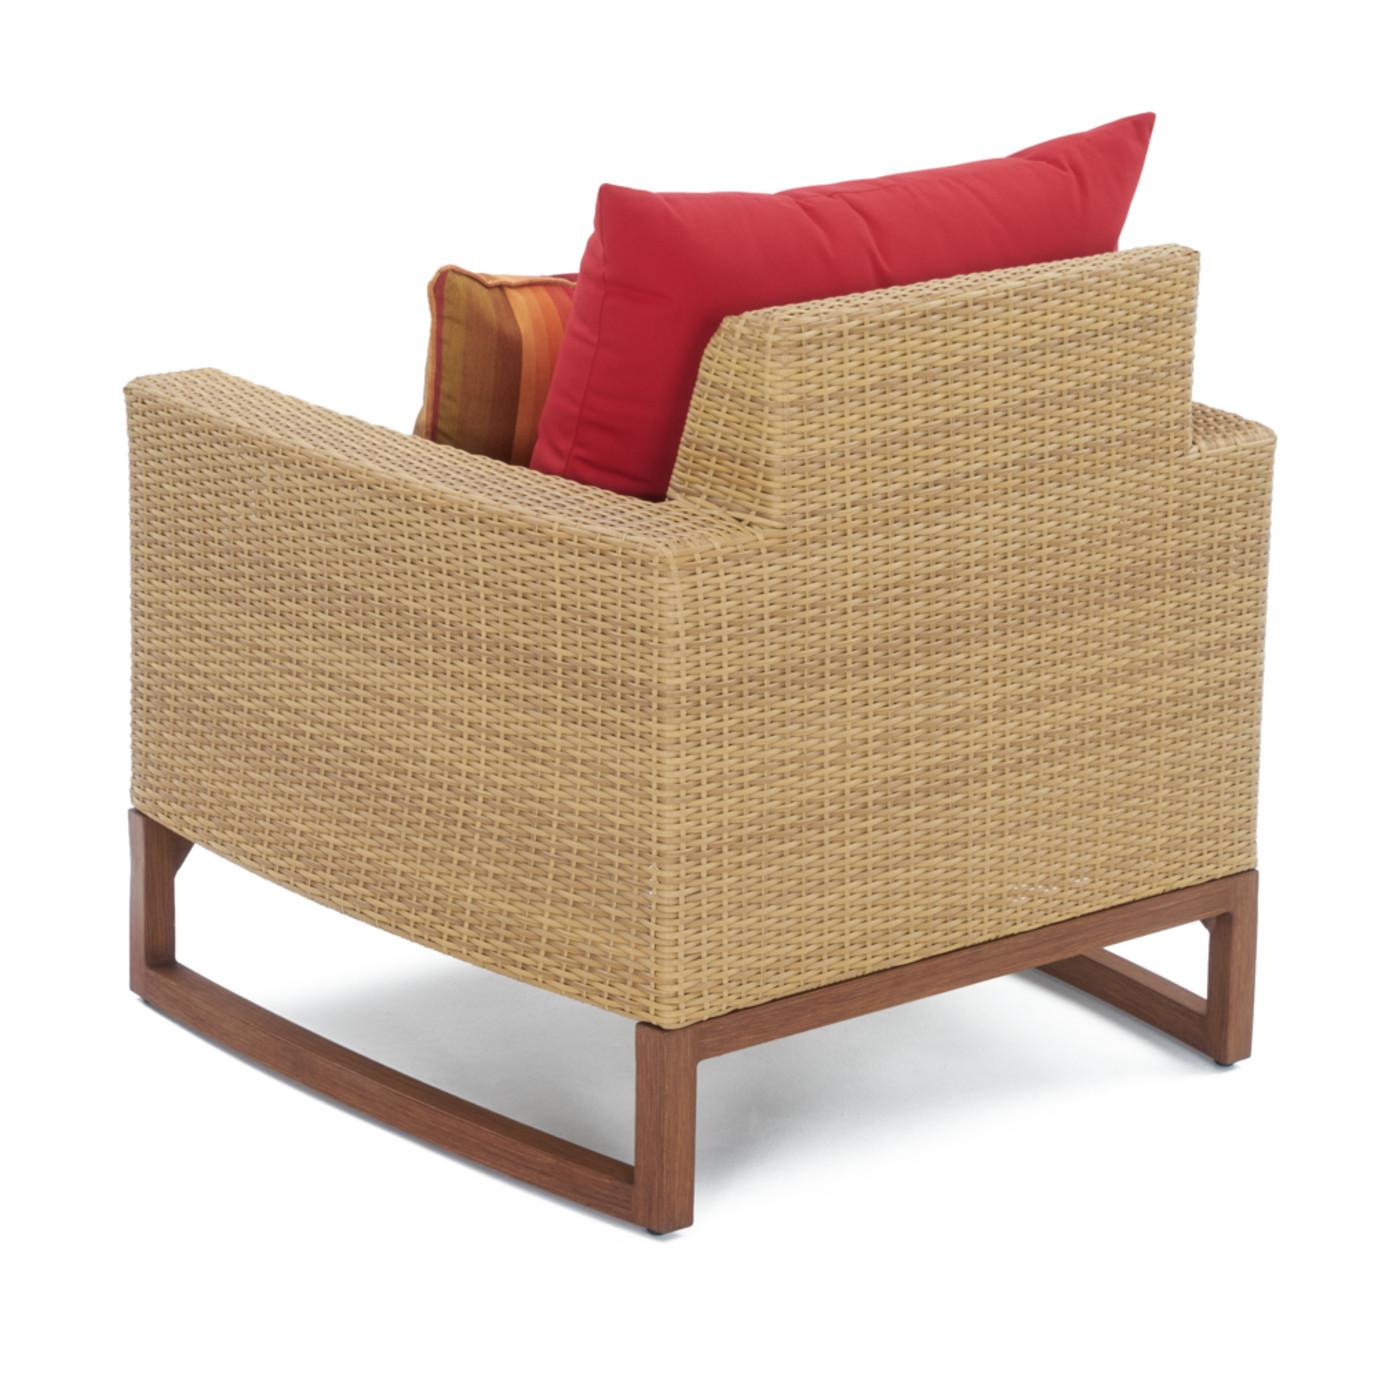 Mili™ 5pc Club Chair & Ottoman Set - Sunset Red